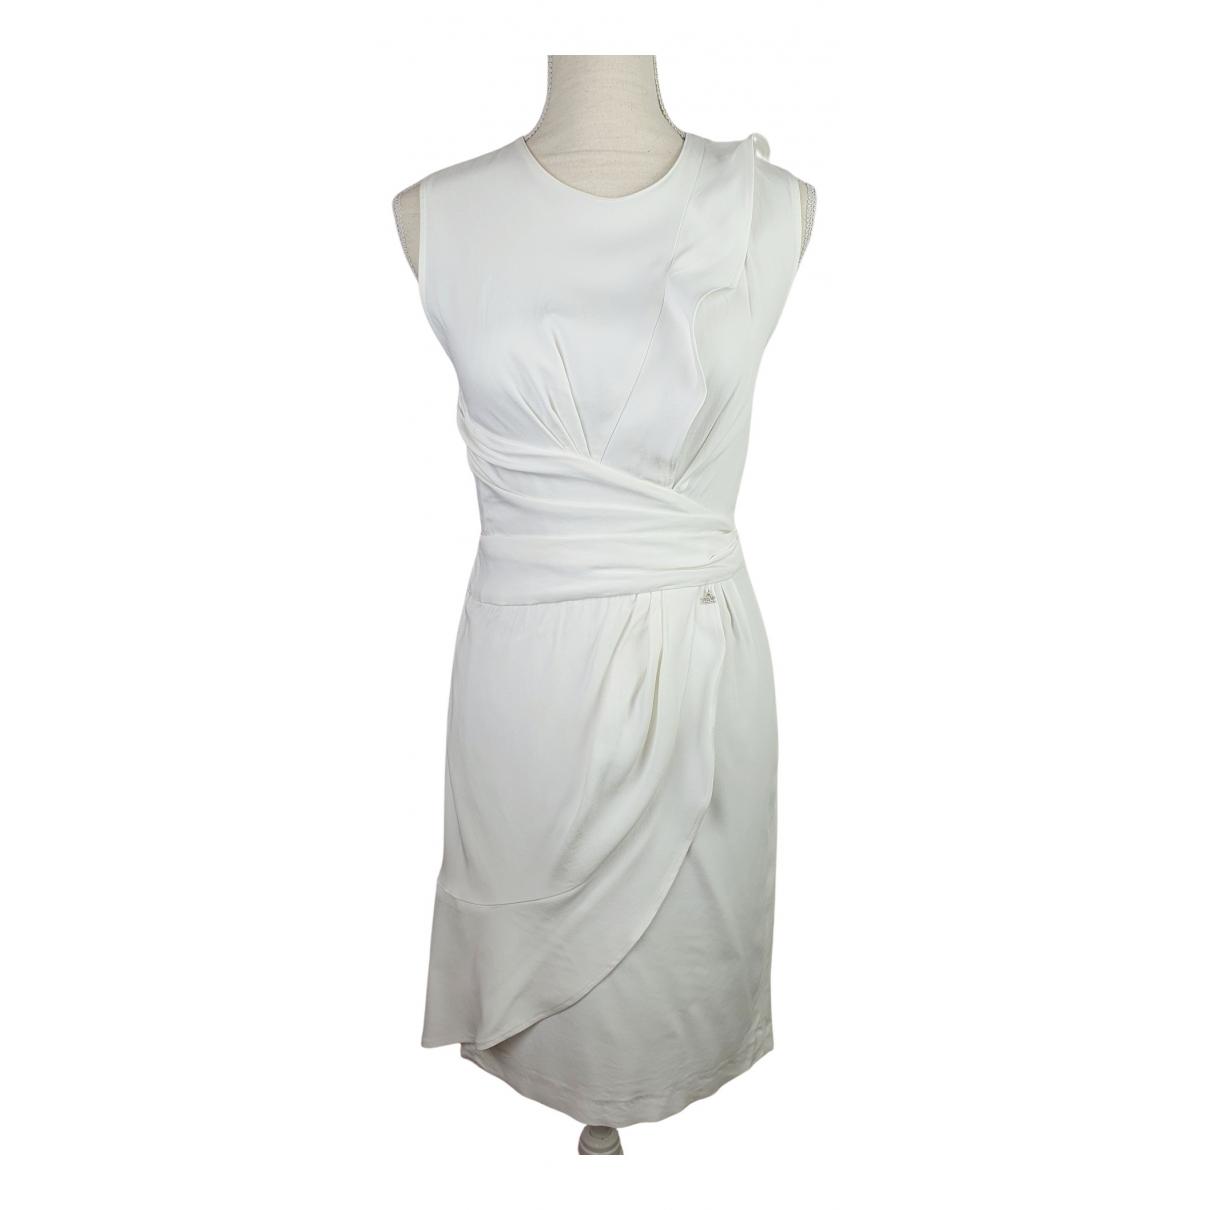 Elisabetta Franchi N White dress for Women 42 IT